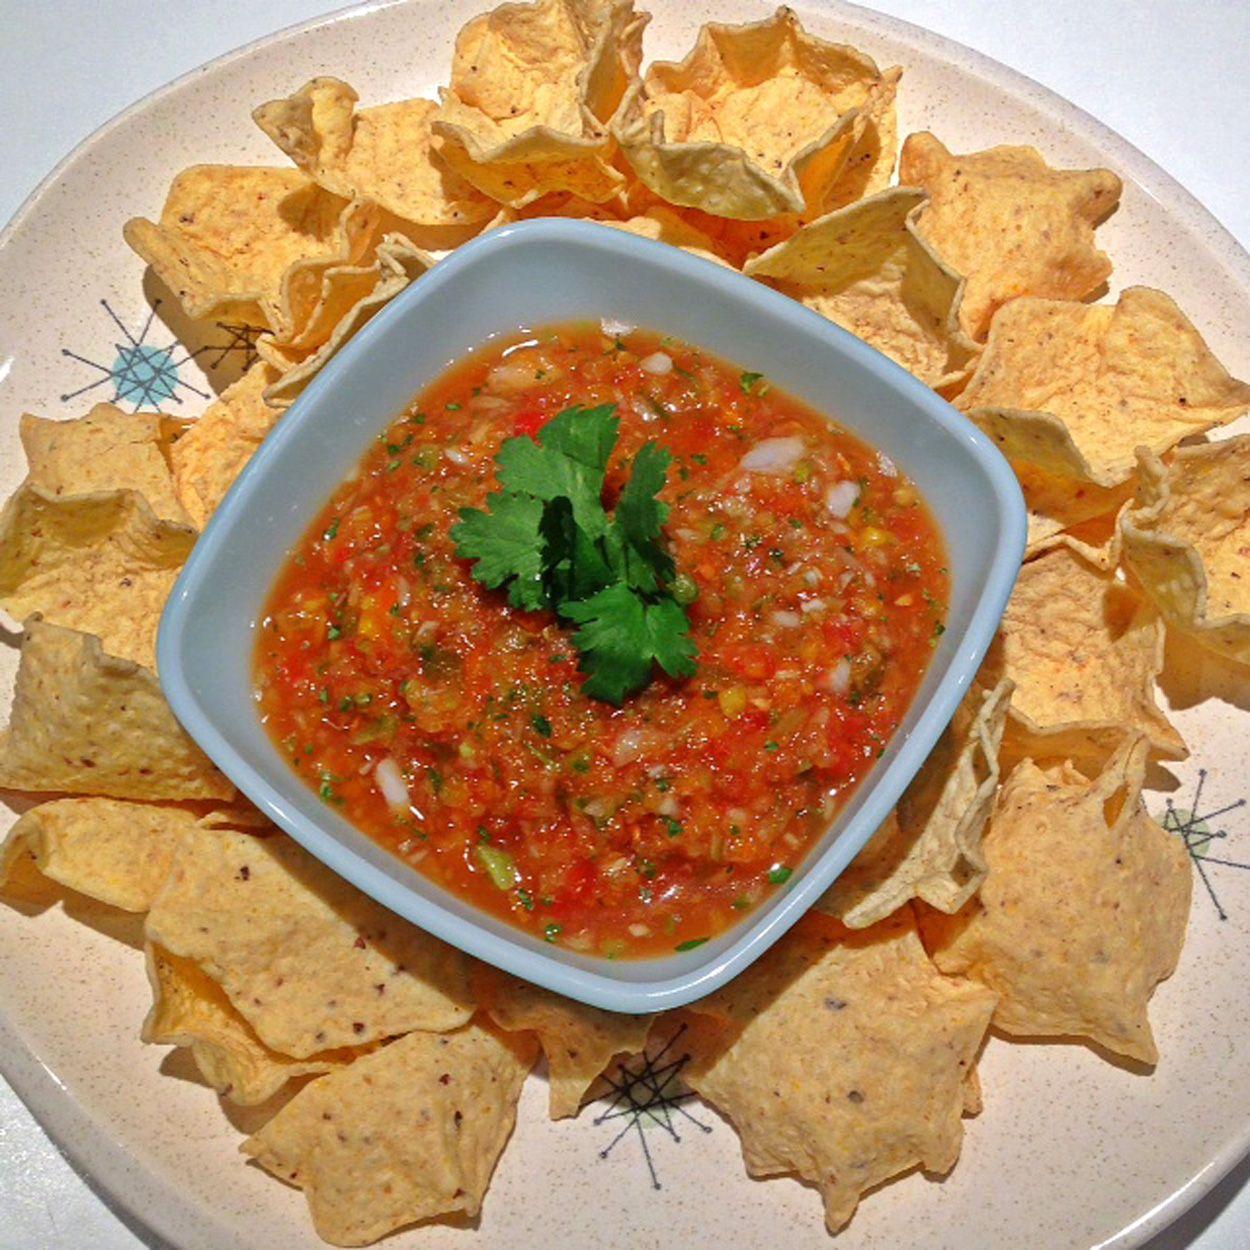 Happy Cinco de Mayo. Let's have some chips 'n salsa!